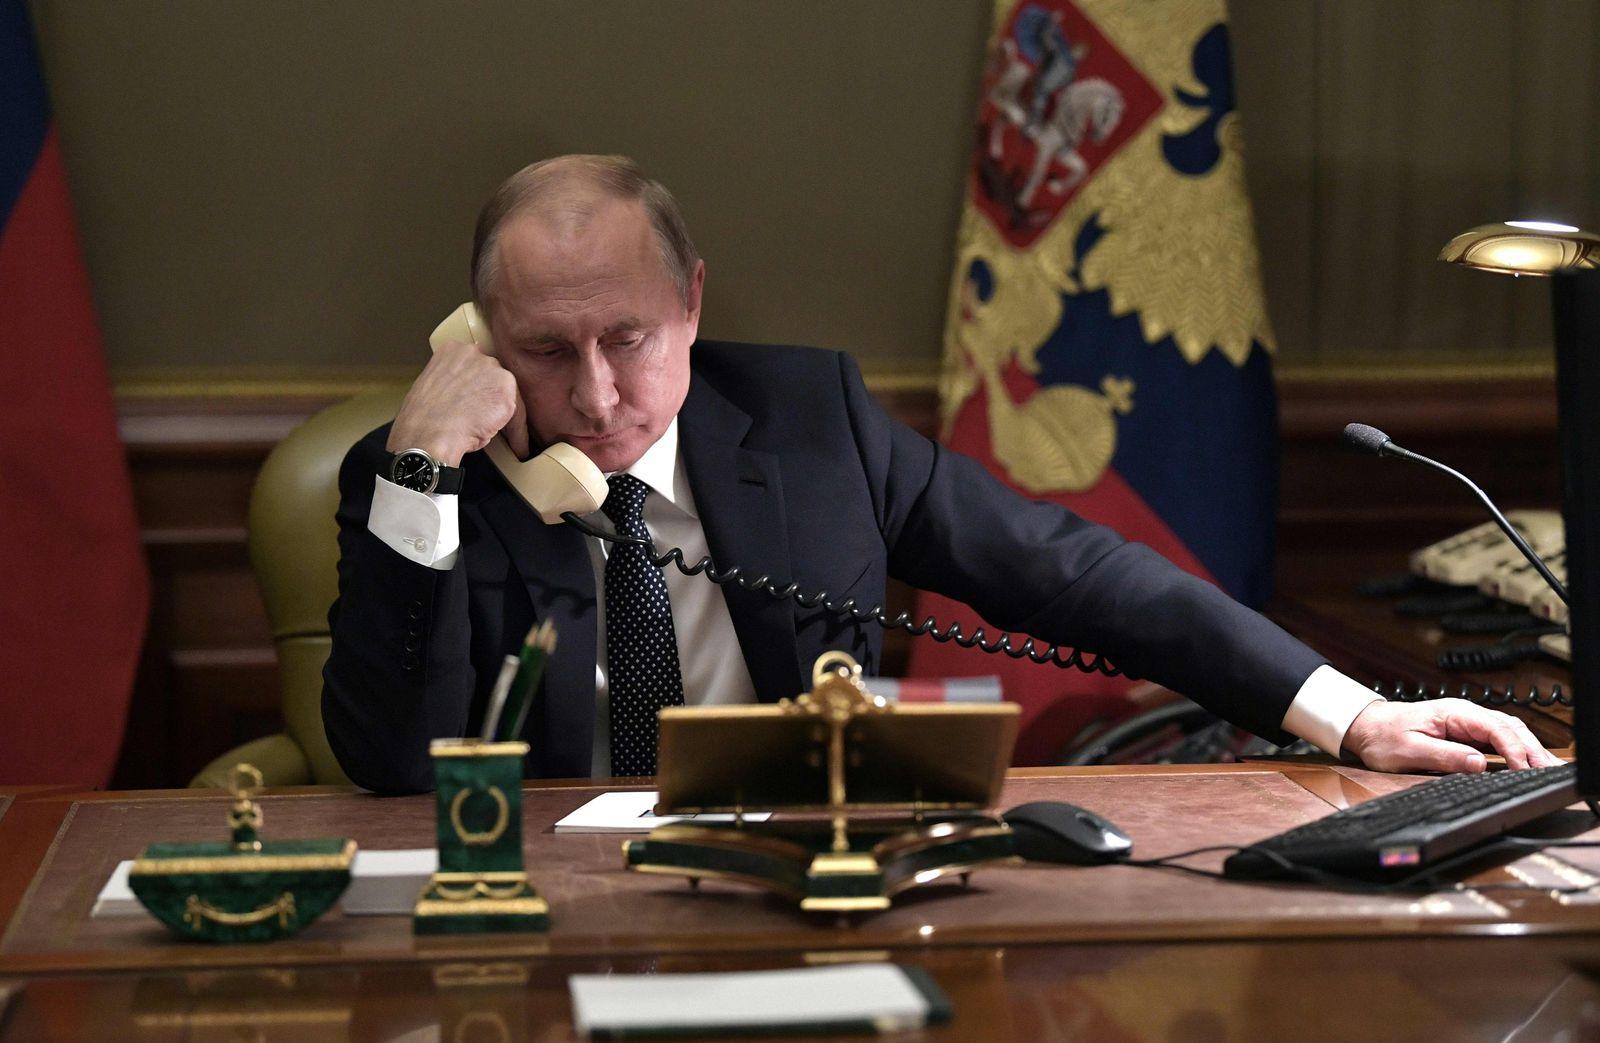 Auslandspolitiker 2018/ Putin